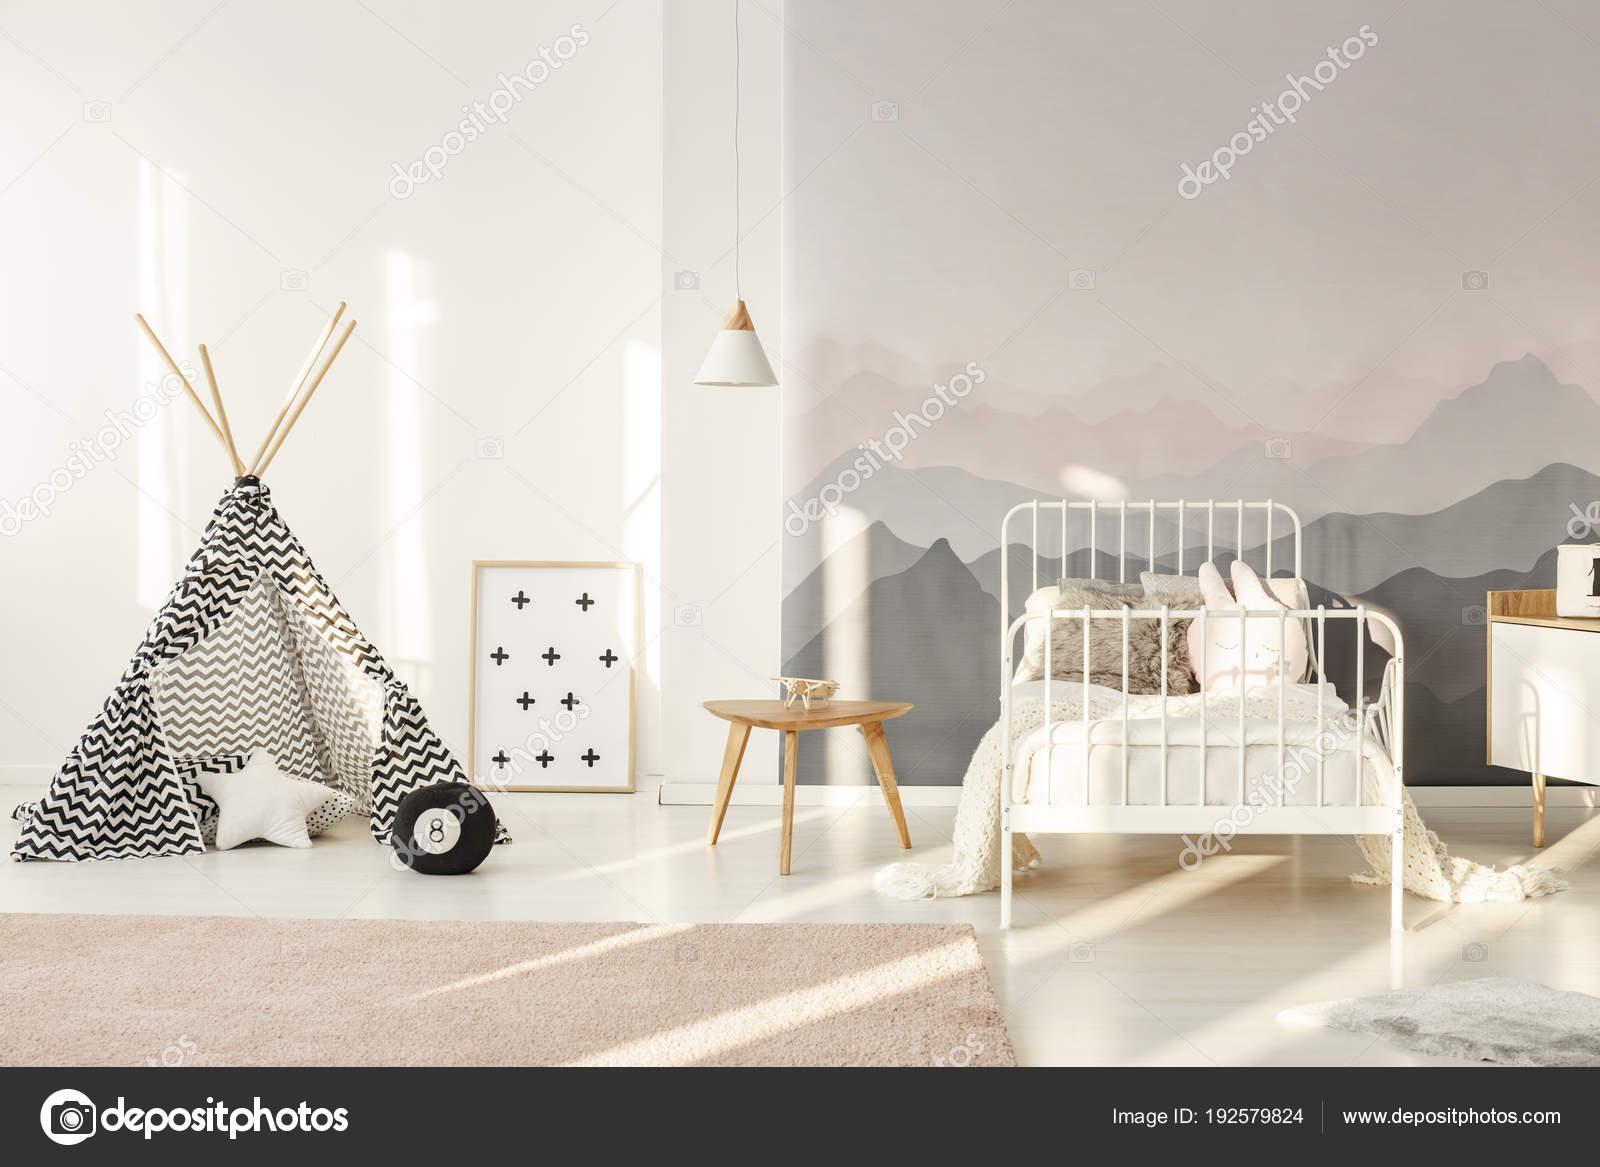 Kinderkamer Patronen Behang : Tipi in kinderkamer u stockfoto photographee eu